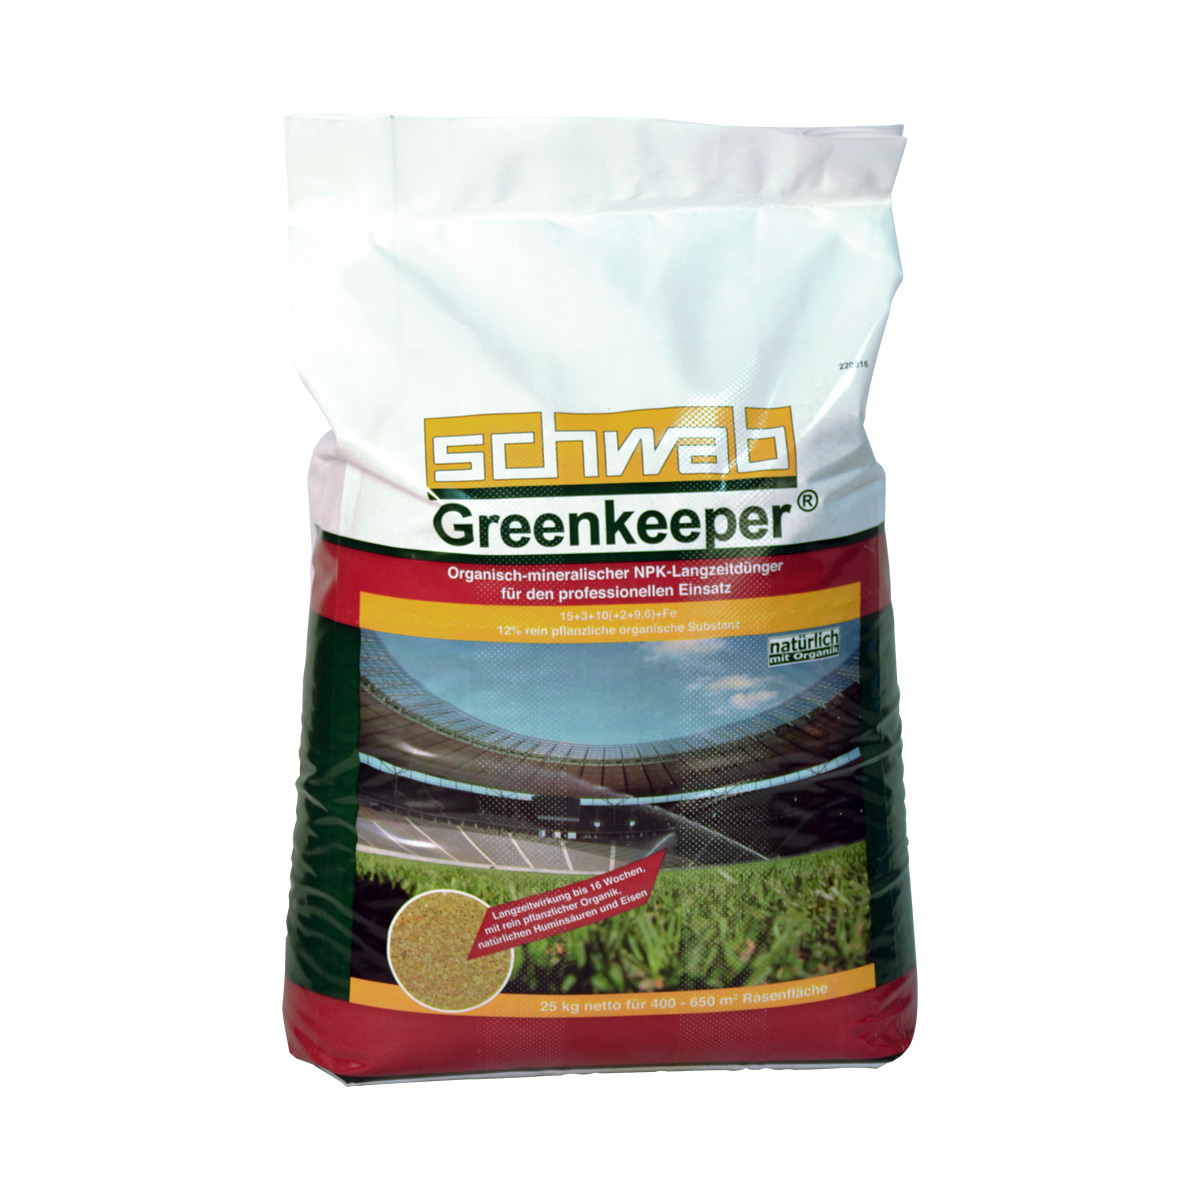 Greenkeeper® (25 kg)